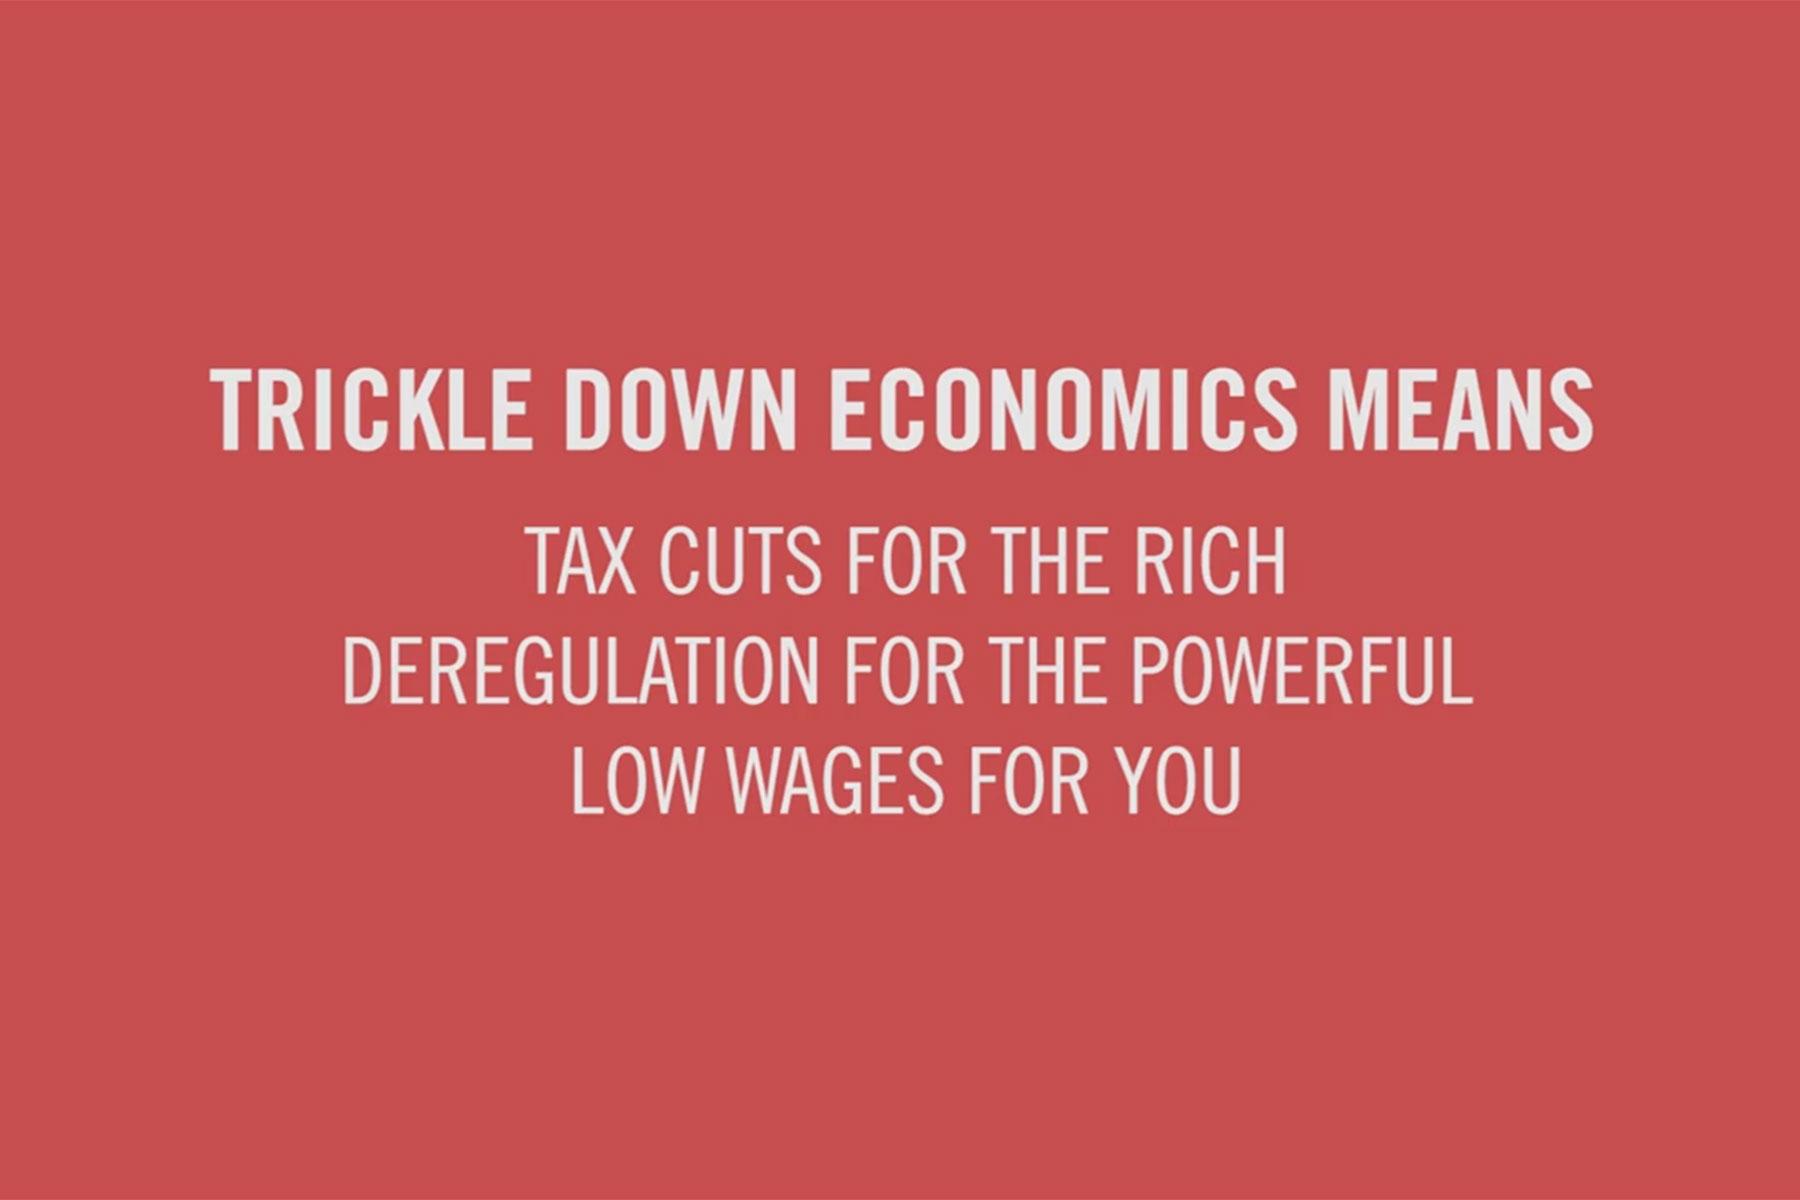 Paul Ryan parody video explains myth of Trickle-Down Economics ...